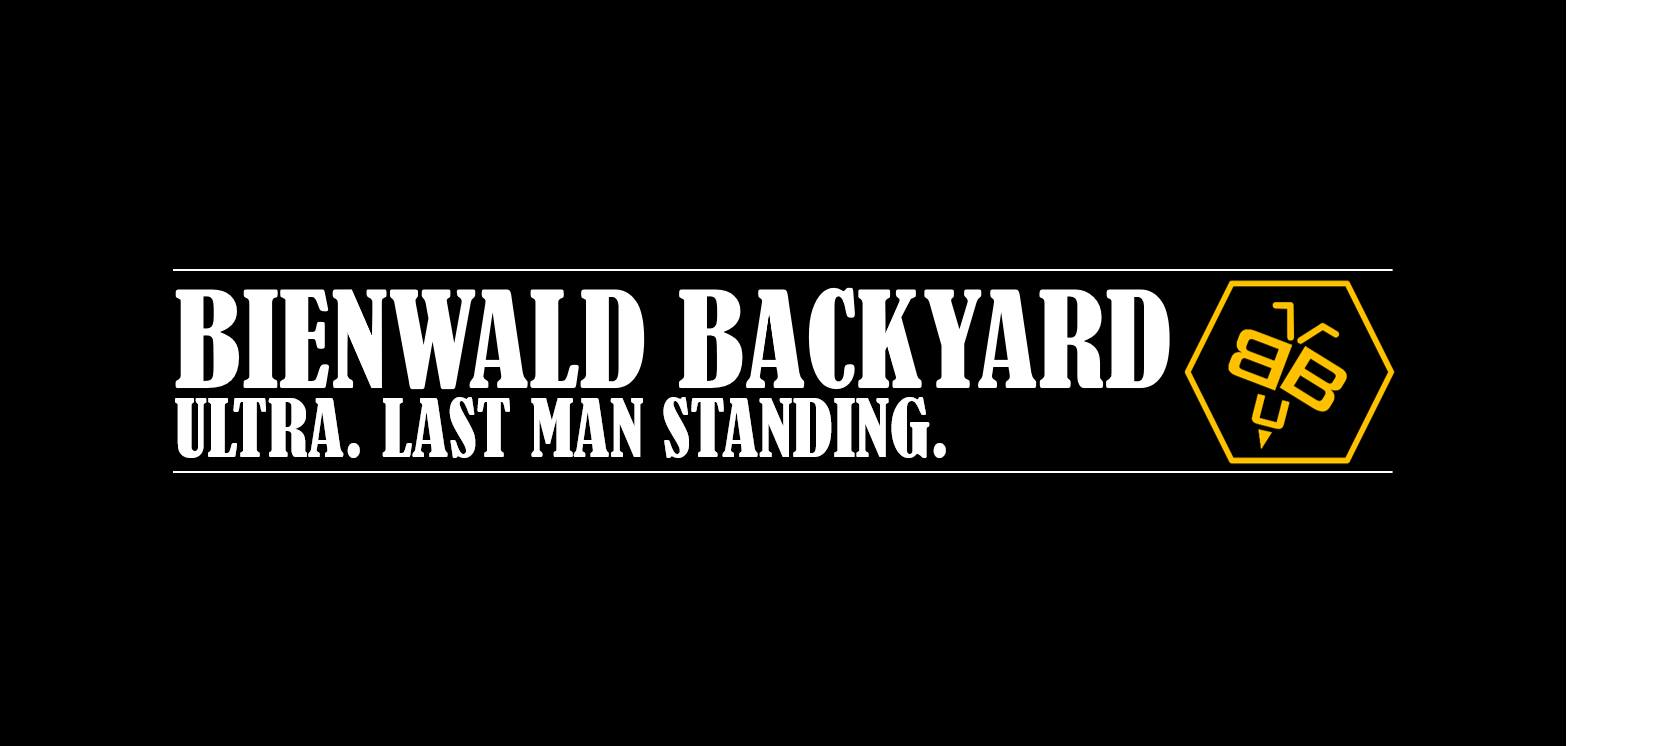 Bienwald Backyard Ultra Kandel